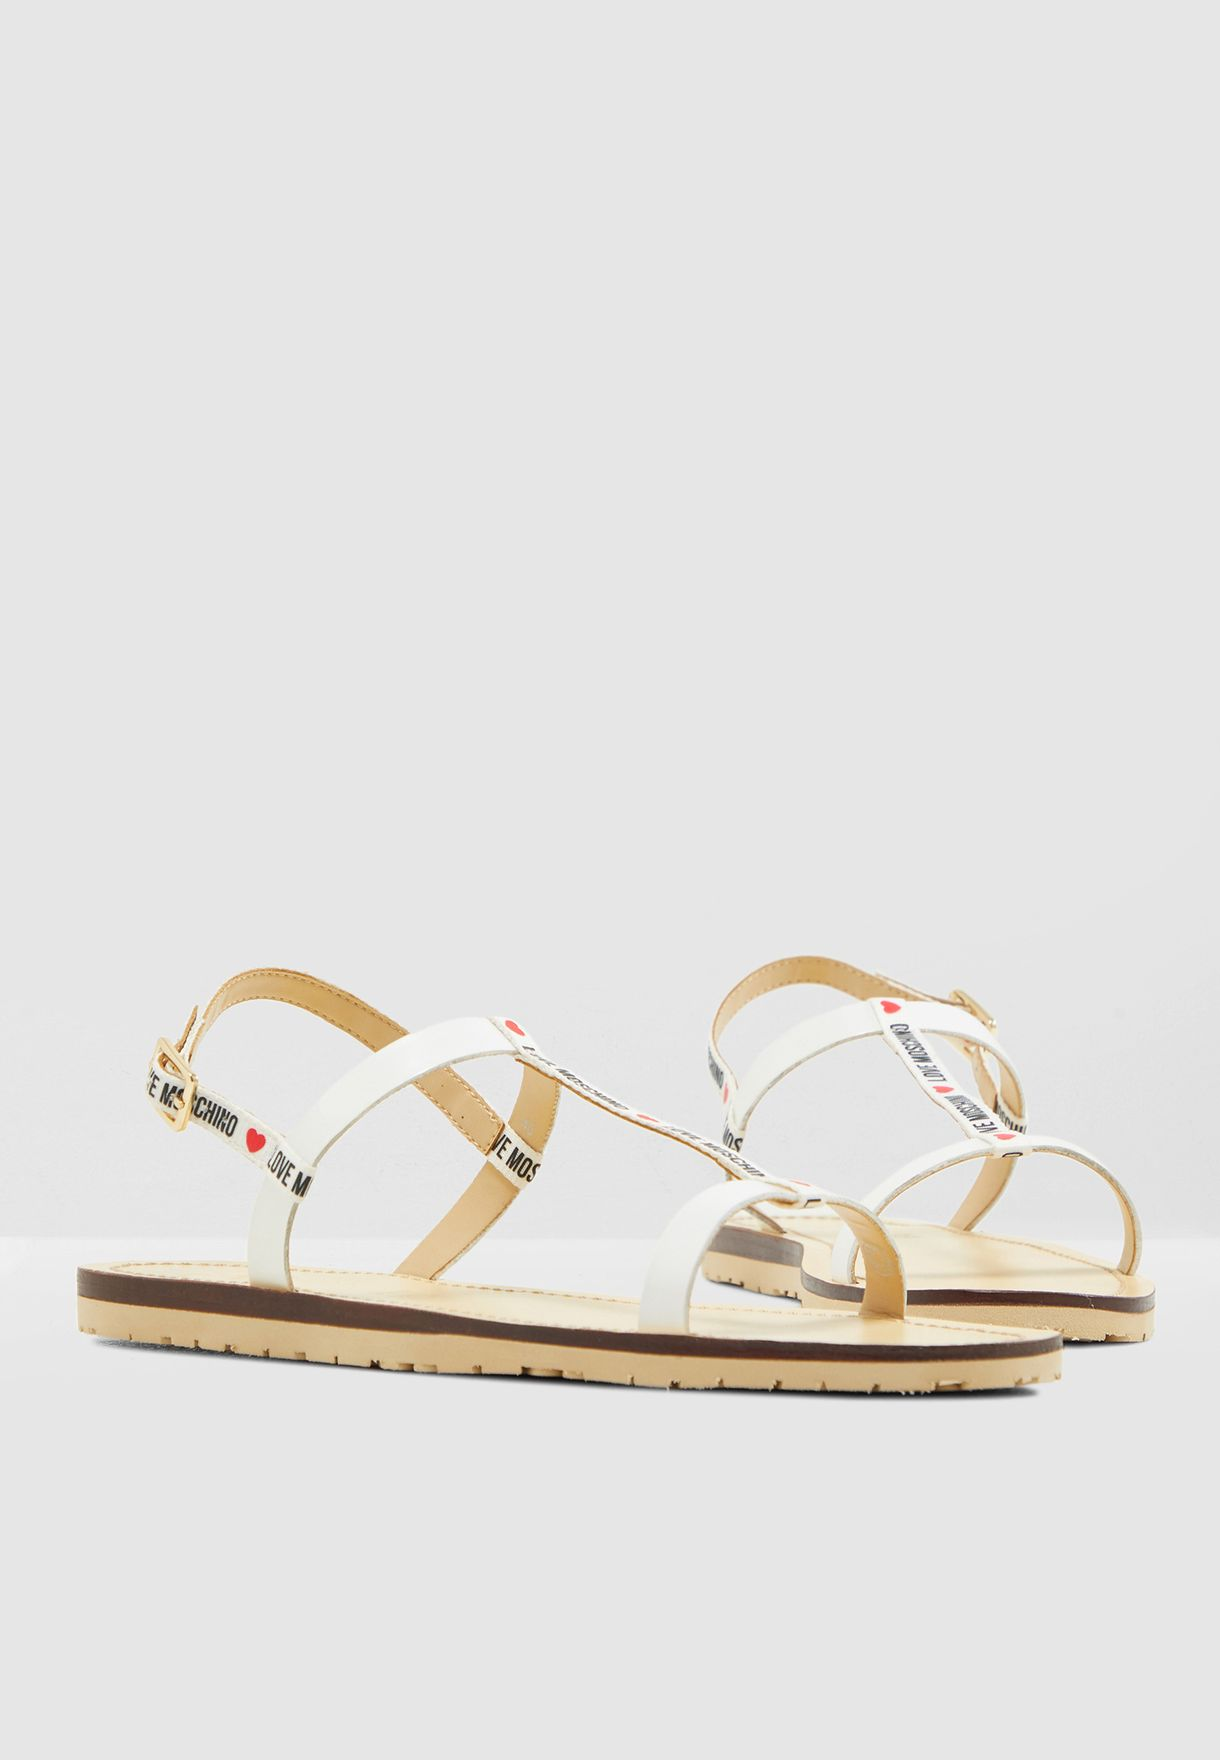 c9ff0fbbd1f4 Shop Love Moschino white Casual Flat Sandal JA16421G07JV110B for ...